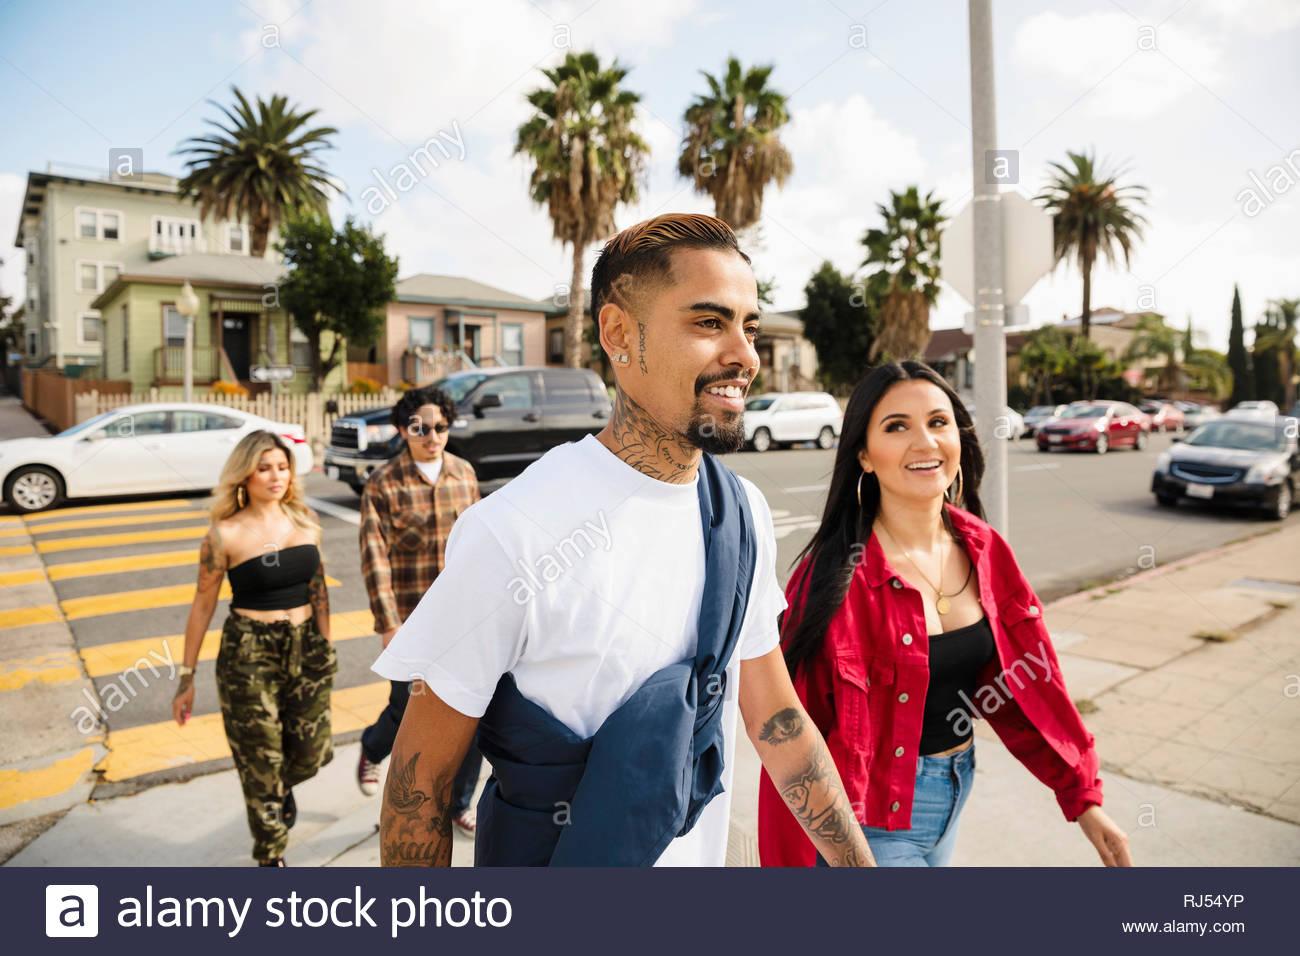 Latinx friends walking in neighborhood - Stock Image